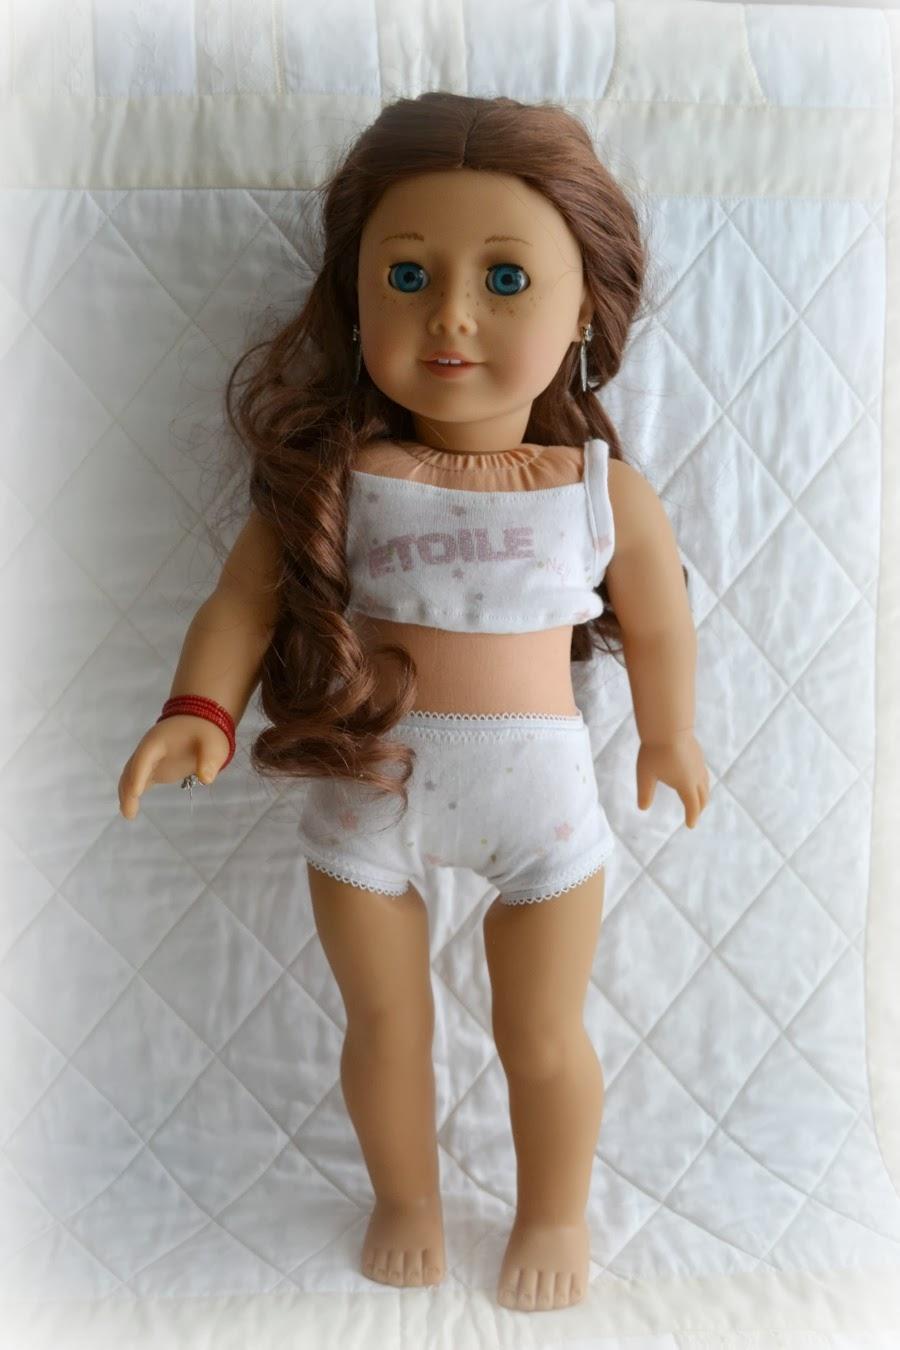 Bear, Dolly and Moi: undergarments for dolls